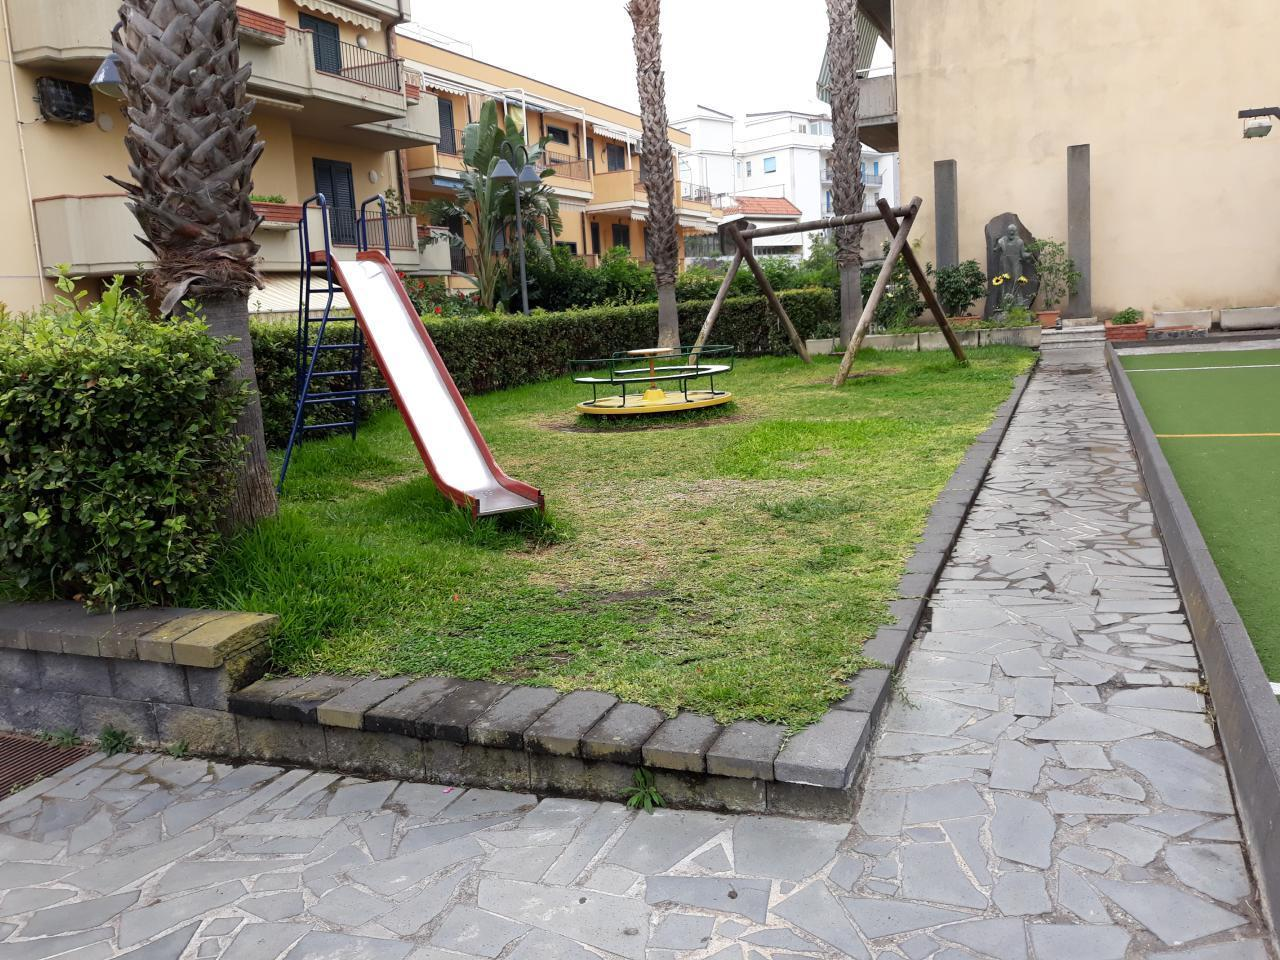 Appartement de vacances MARE - ETNA - TAORMINA (2618228), Mascali, Catania, Sicile, Italie, image 6